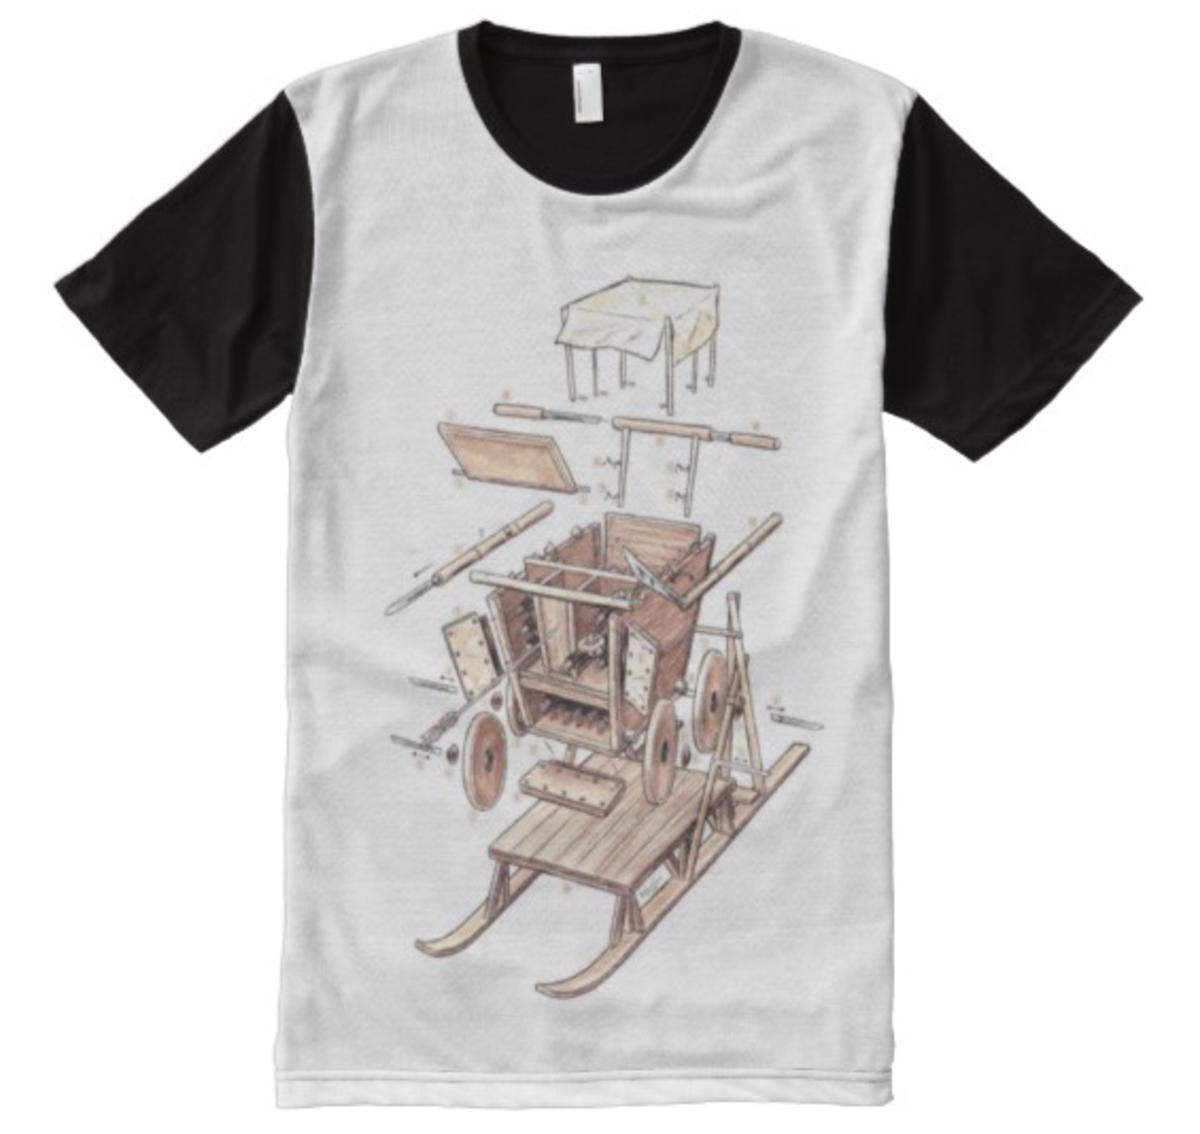 Babycart T-shirt